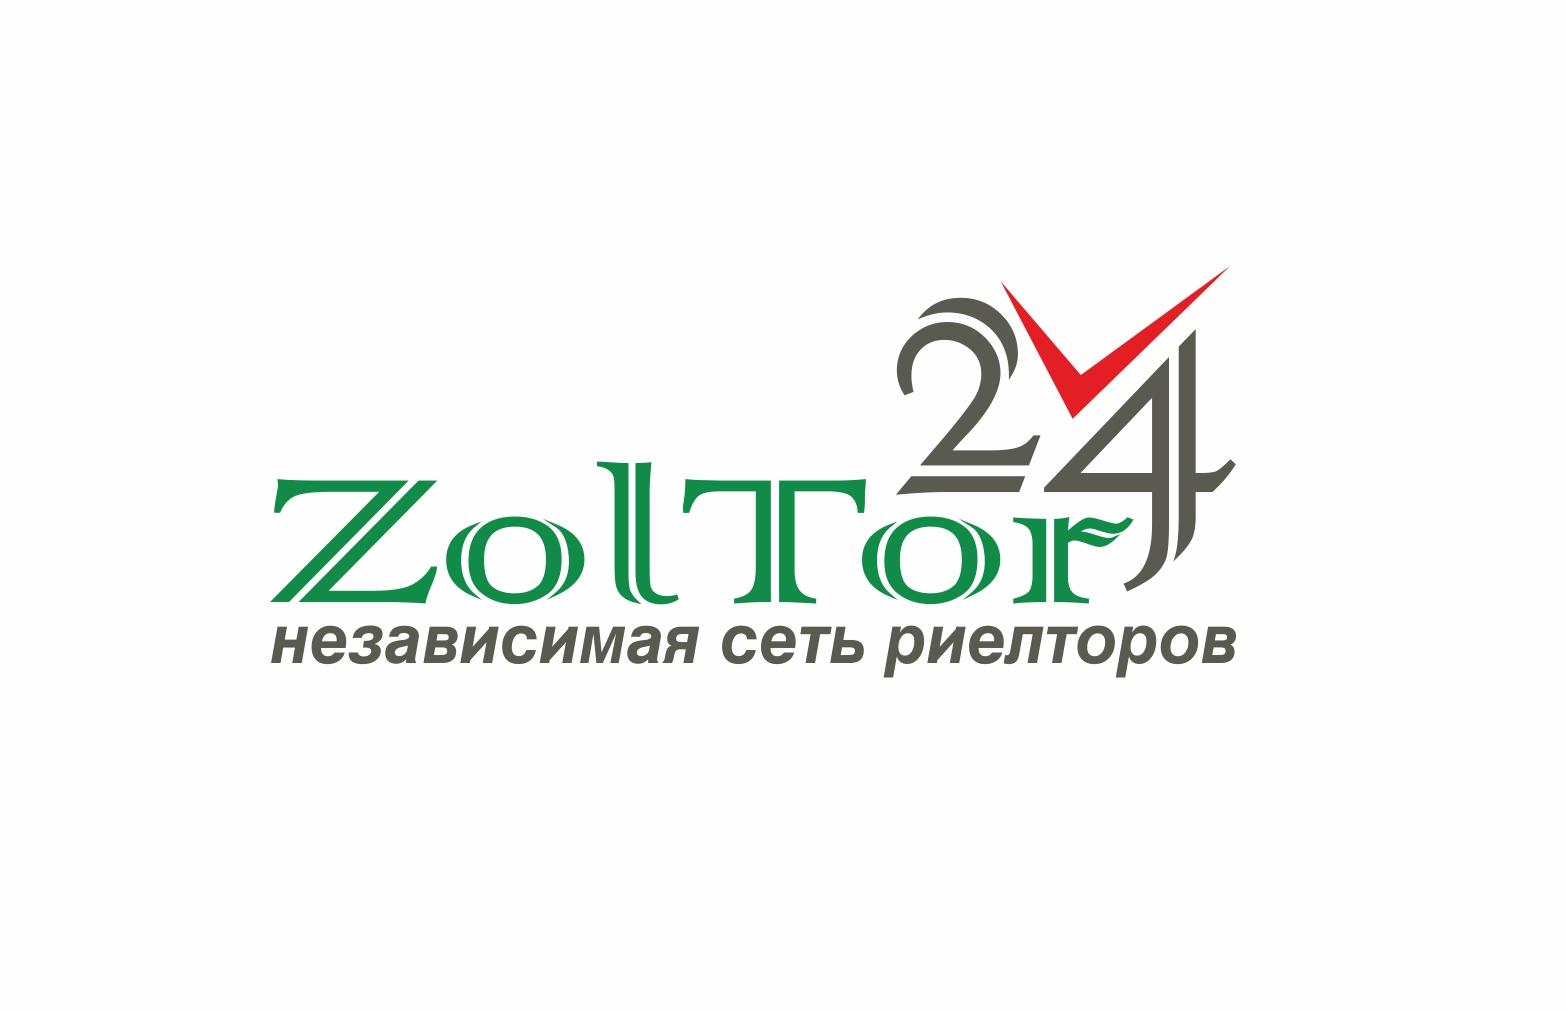 Логотип и фирменный стиль ZolTor24 фото f_7575c87f7d764a55.jpg